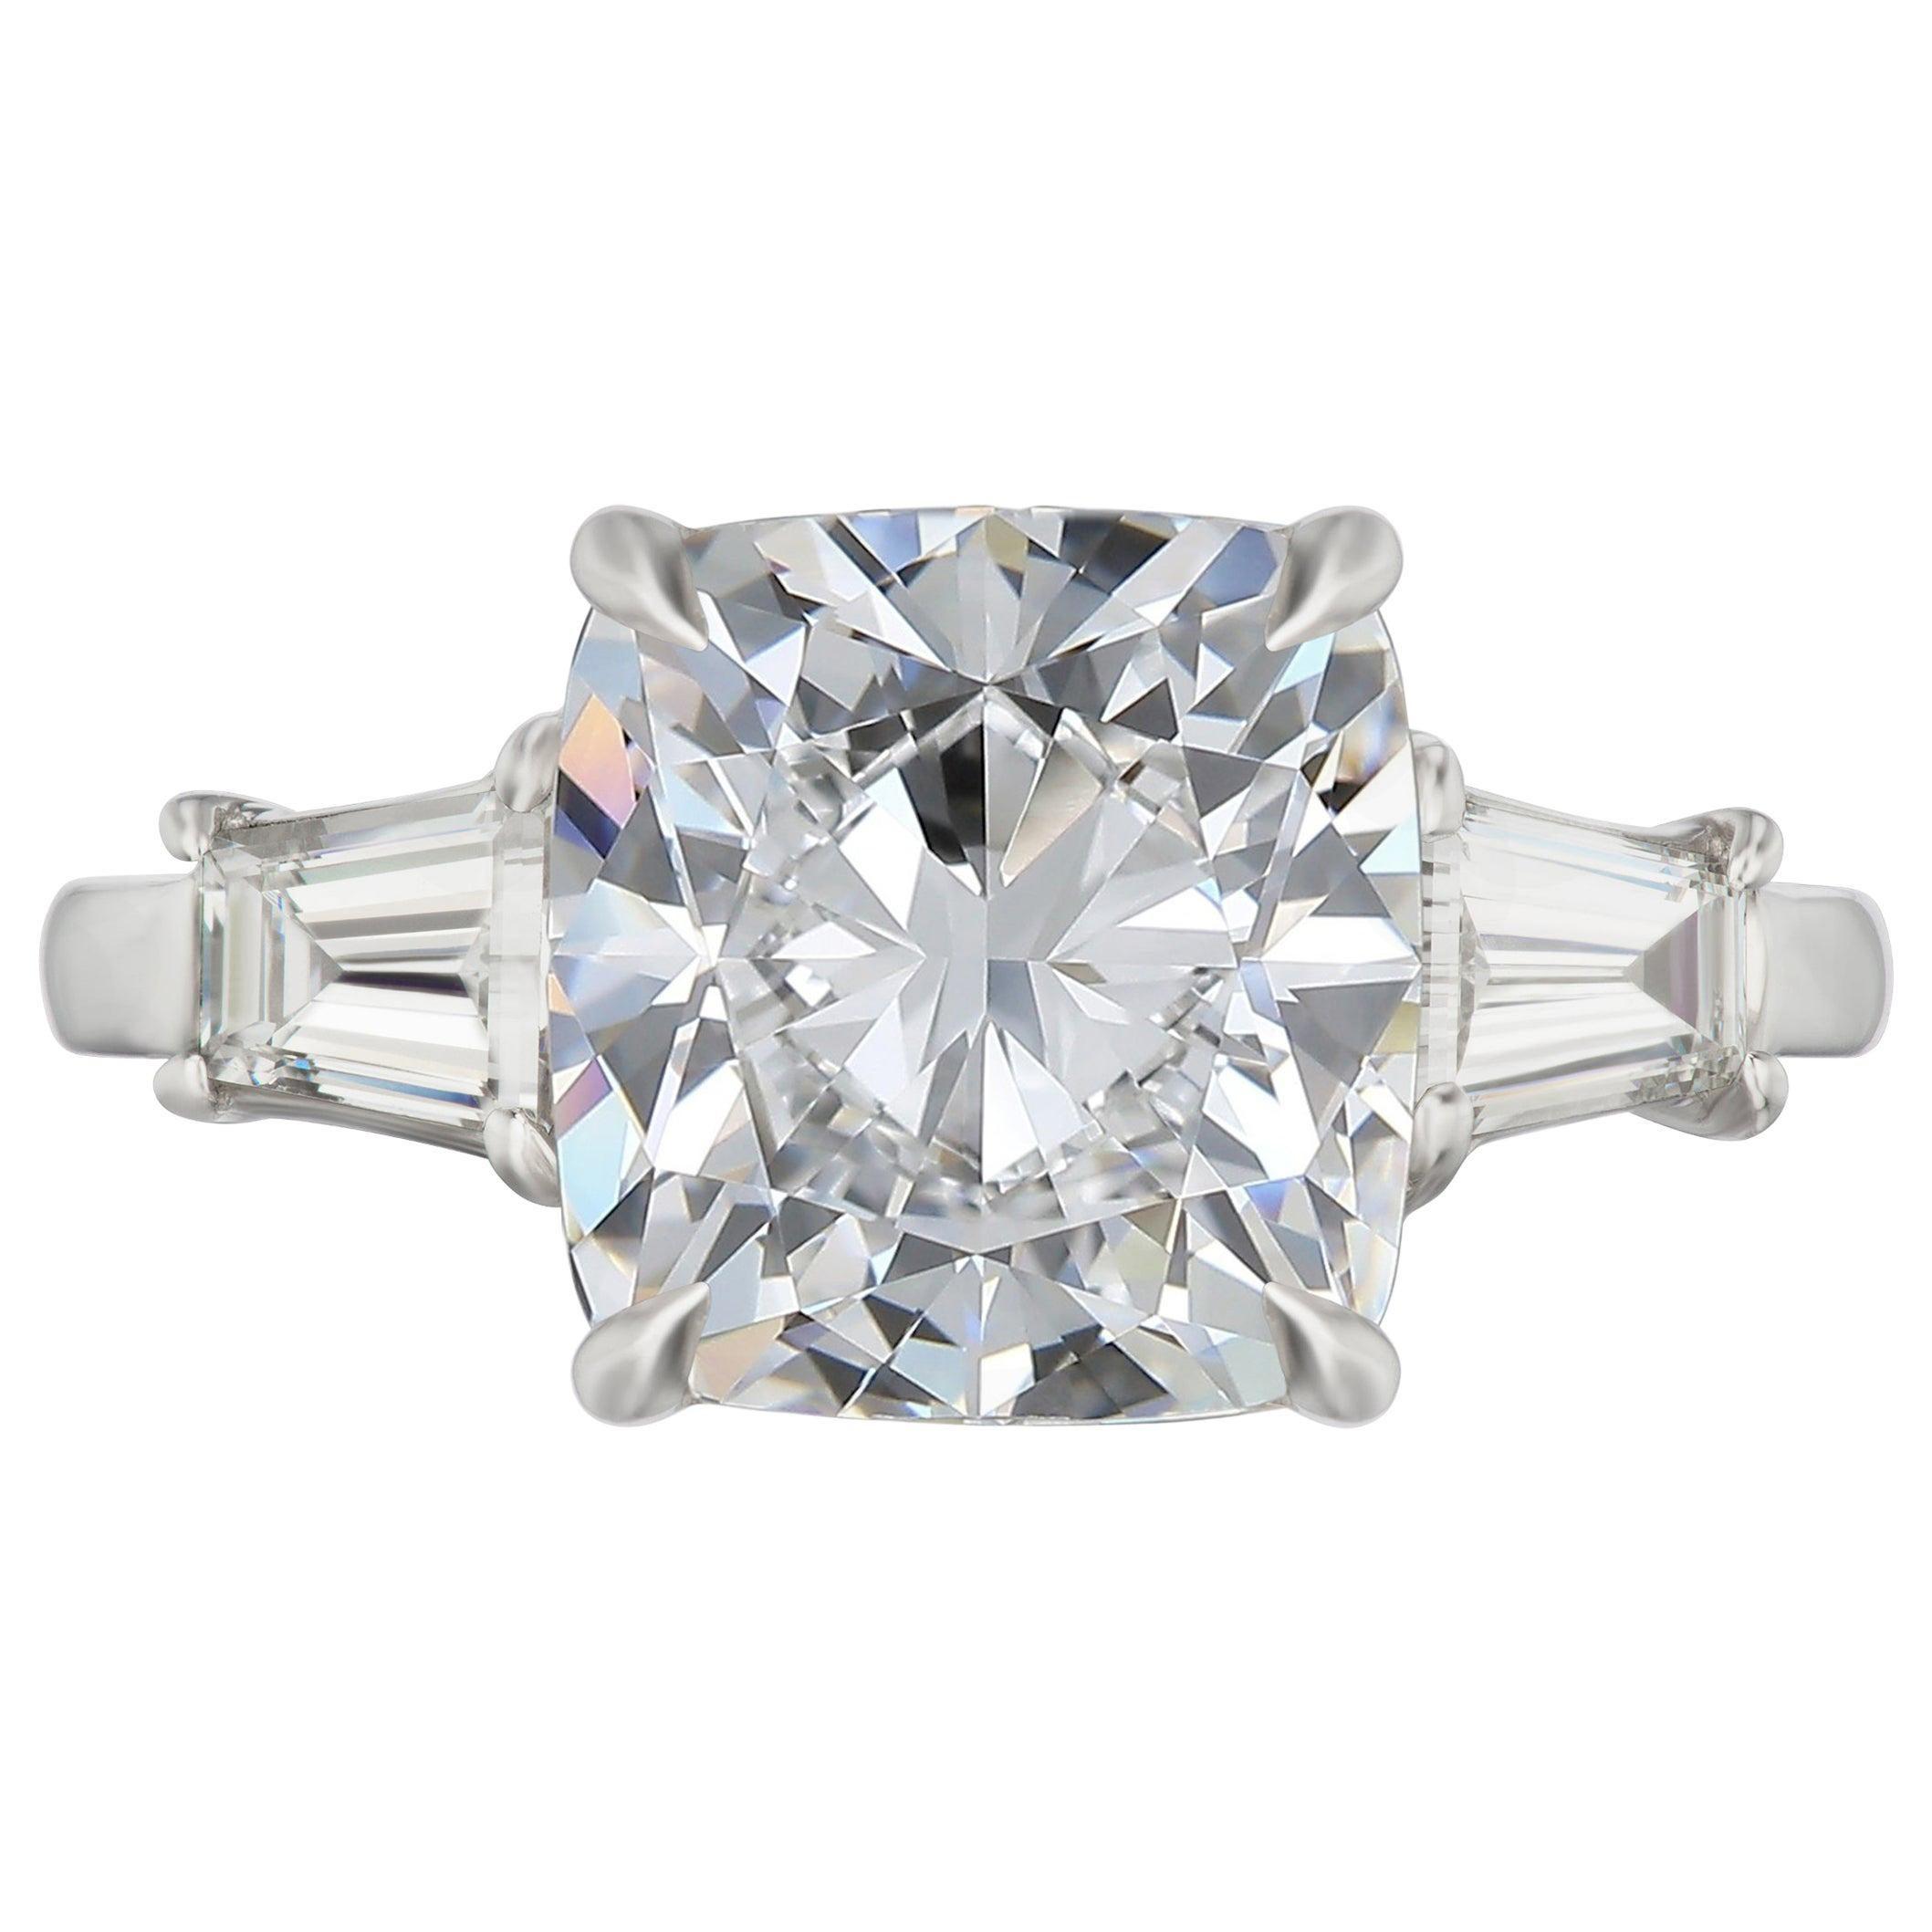 GIA Certified 3 Carat Cushion Modified Brilliant Cut Diamond Ring E Color VVS2